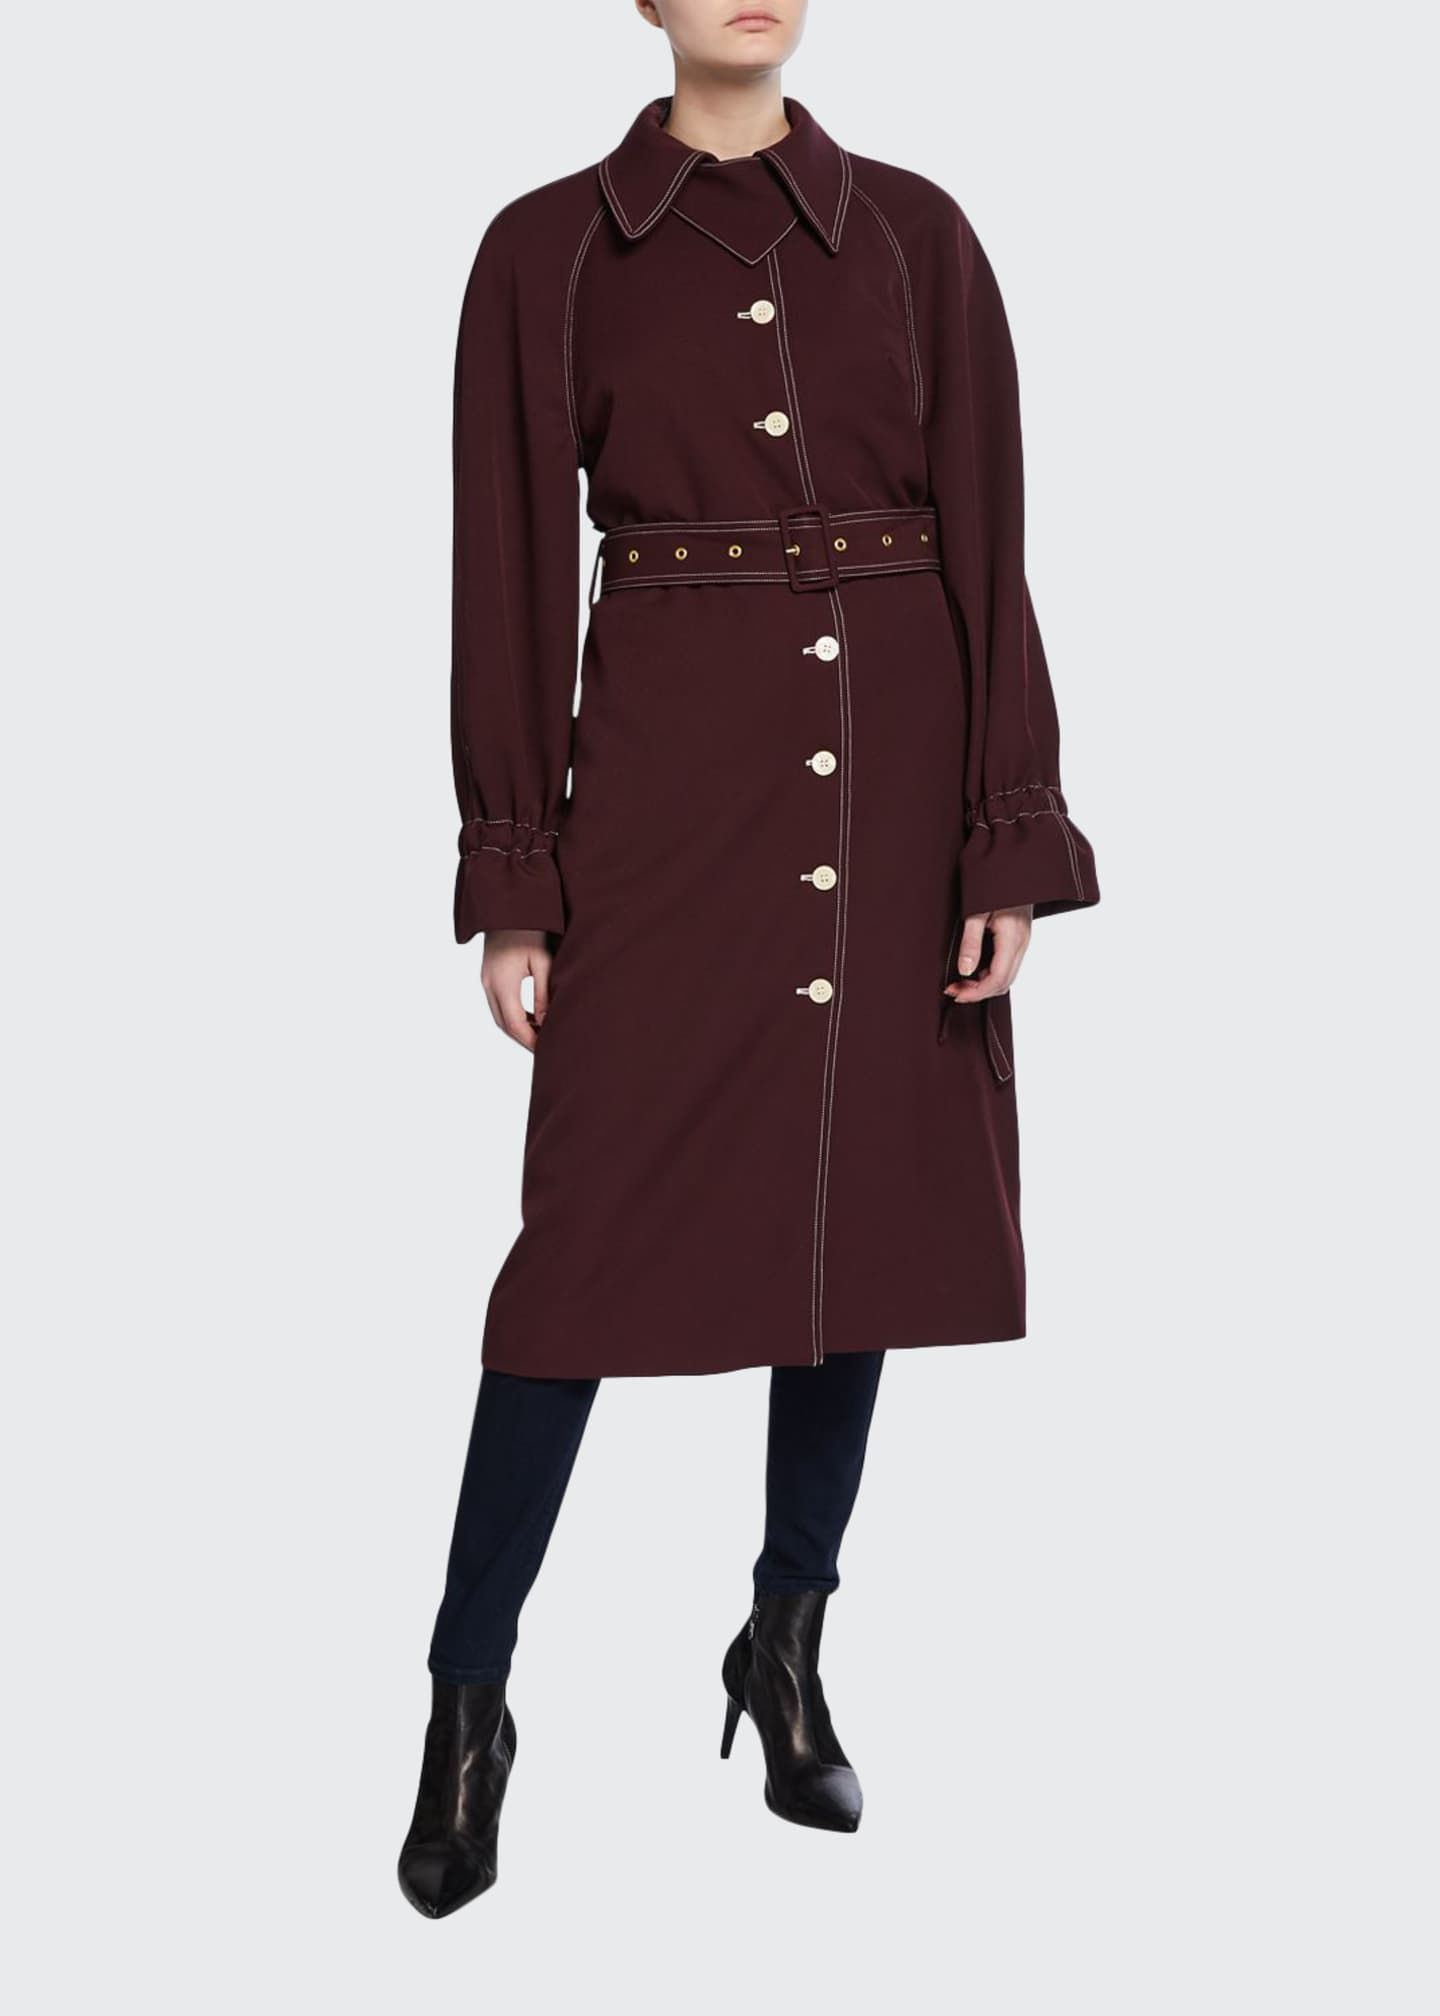 Stine Goya Flo Belted Long Trench Coat